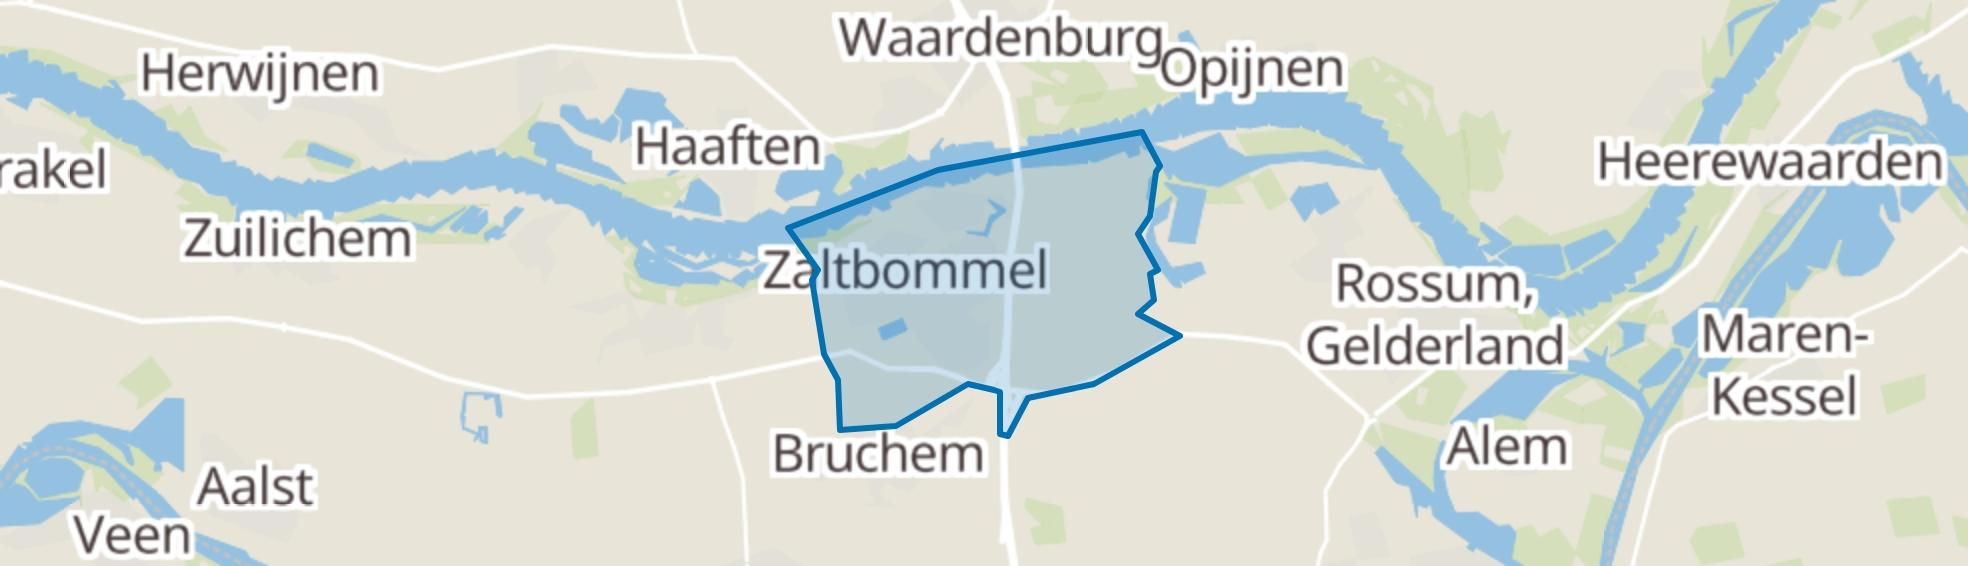 Zaltbommel map